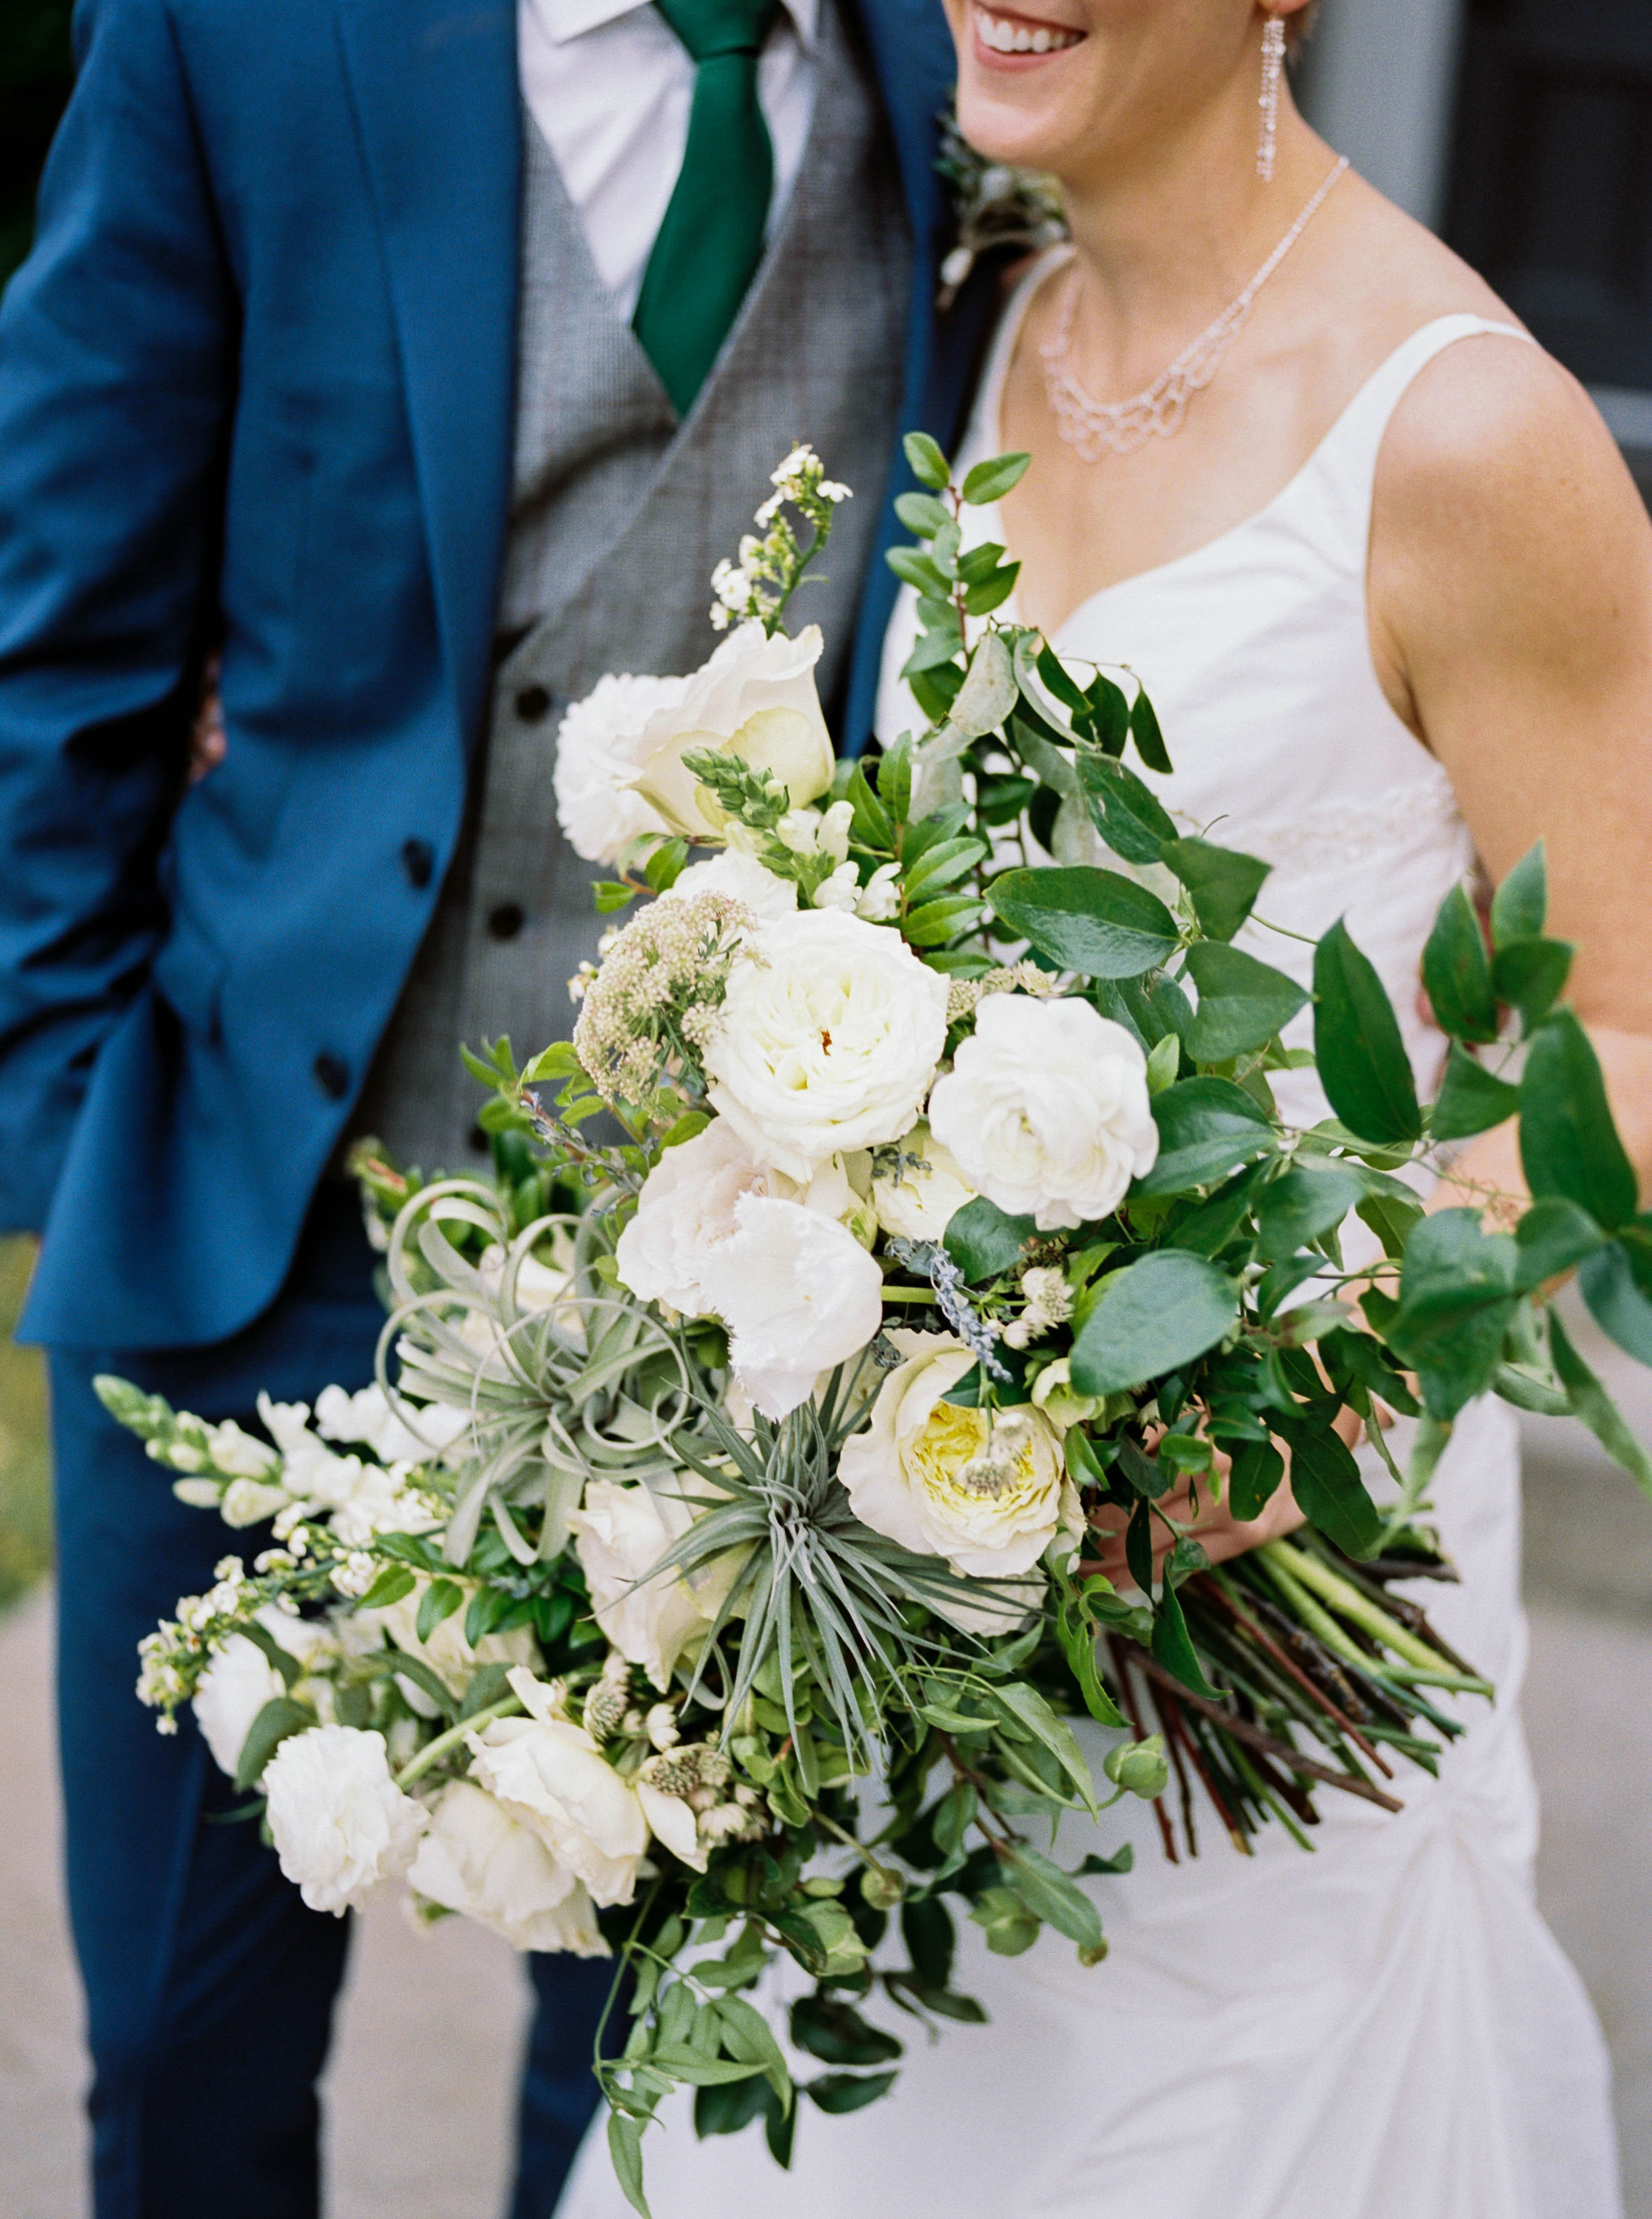 Organic bridal bouquet with garden roses, ranunculus, air plants, and greenery // Nashville, TN Wedding Florist